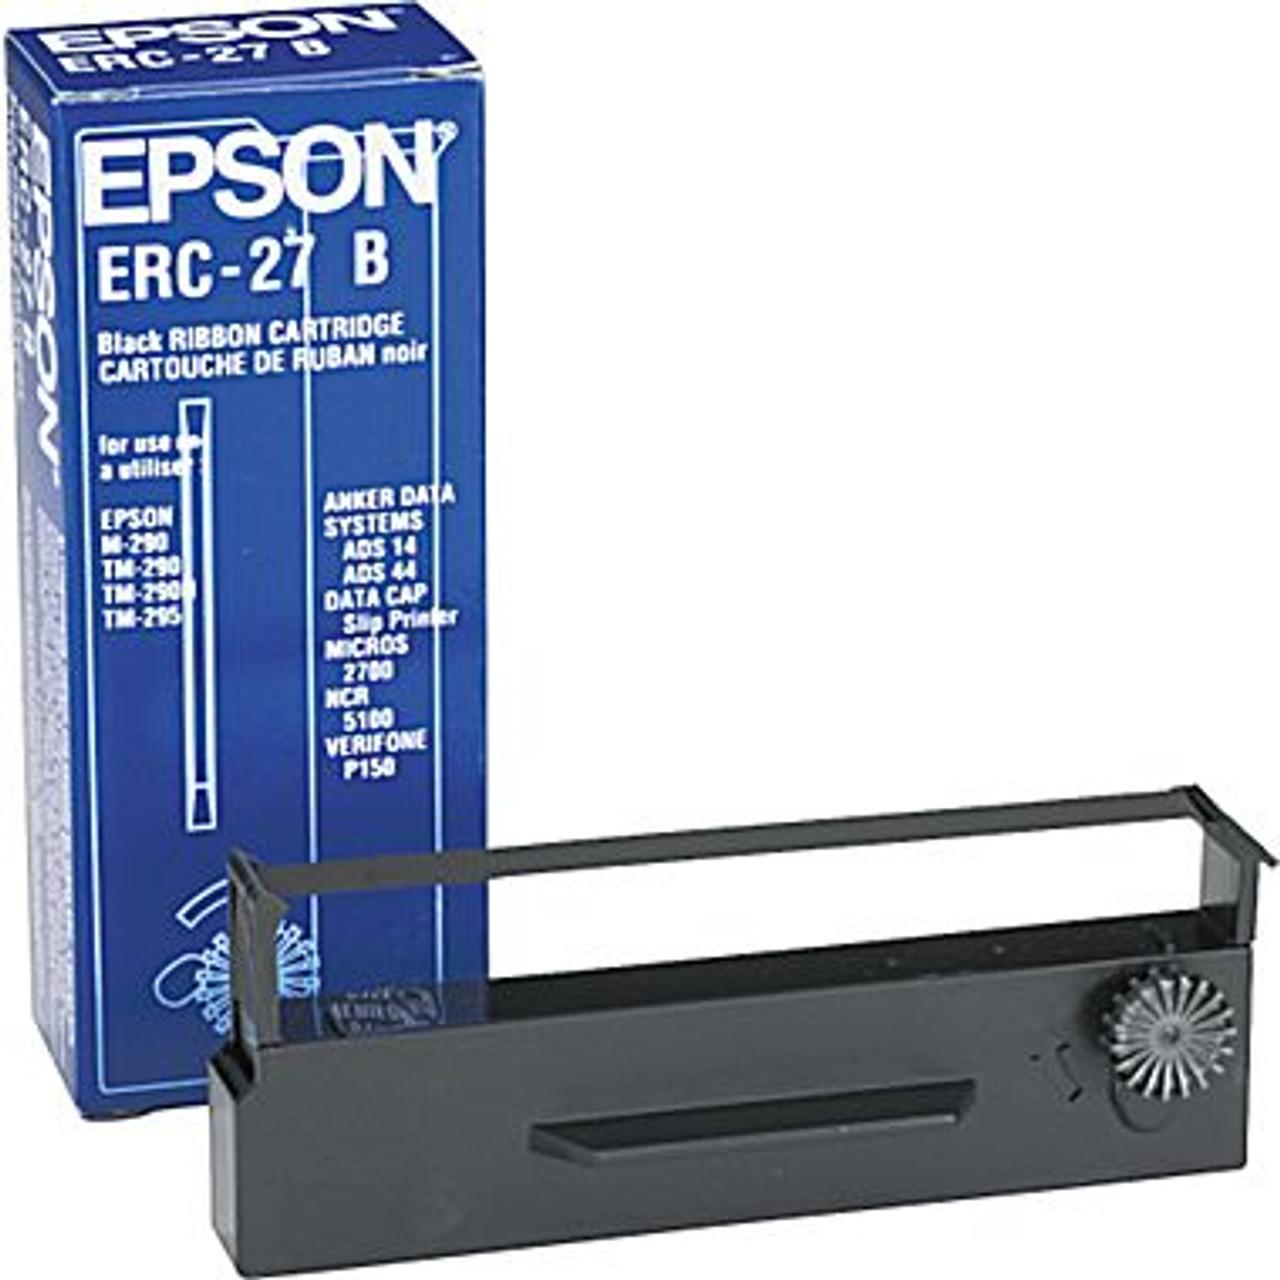 Epson Slip Printer Black Ink Ribbon